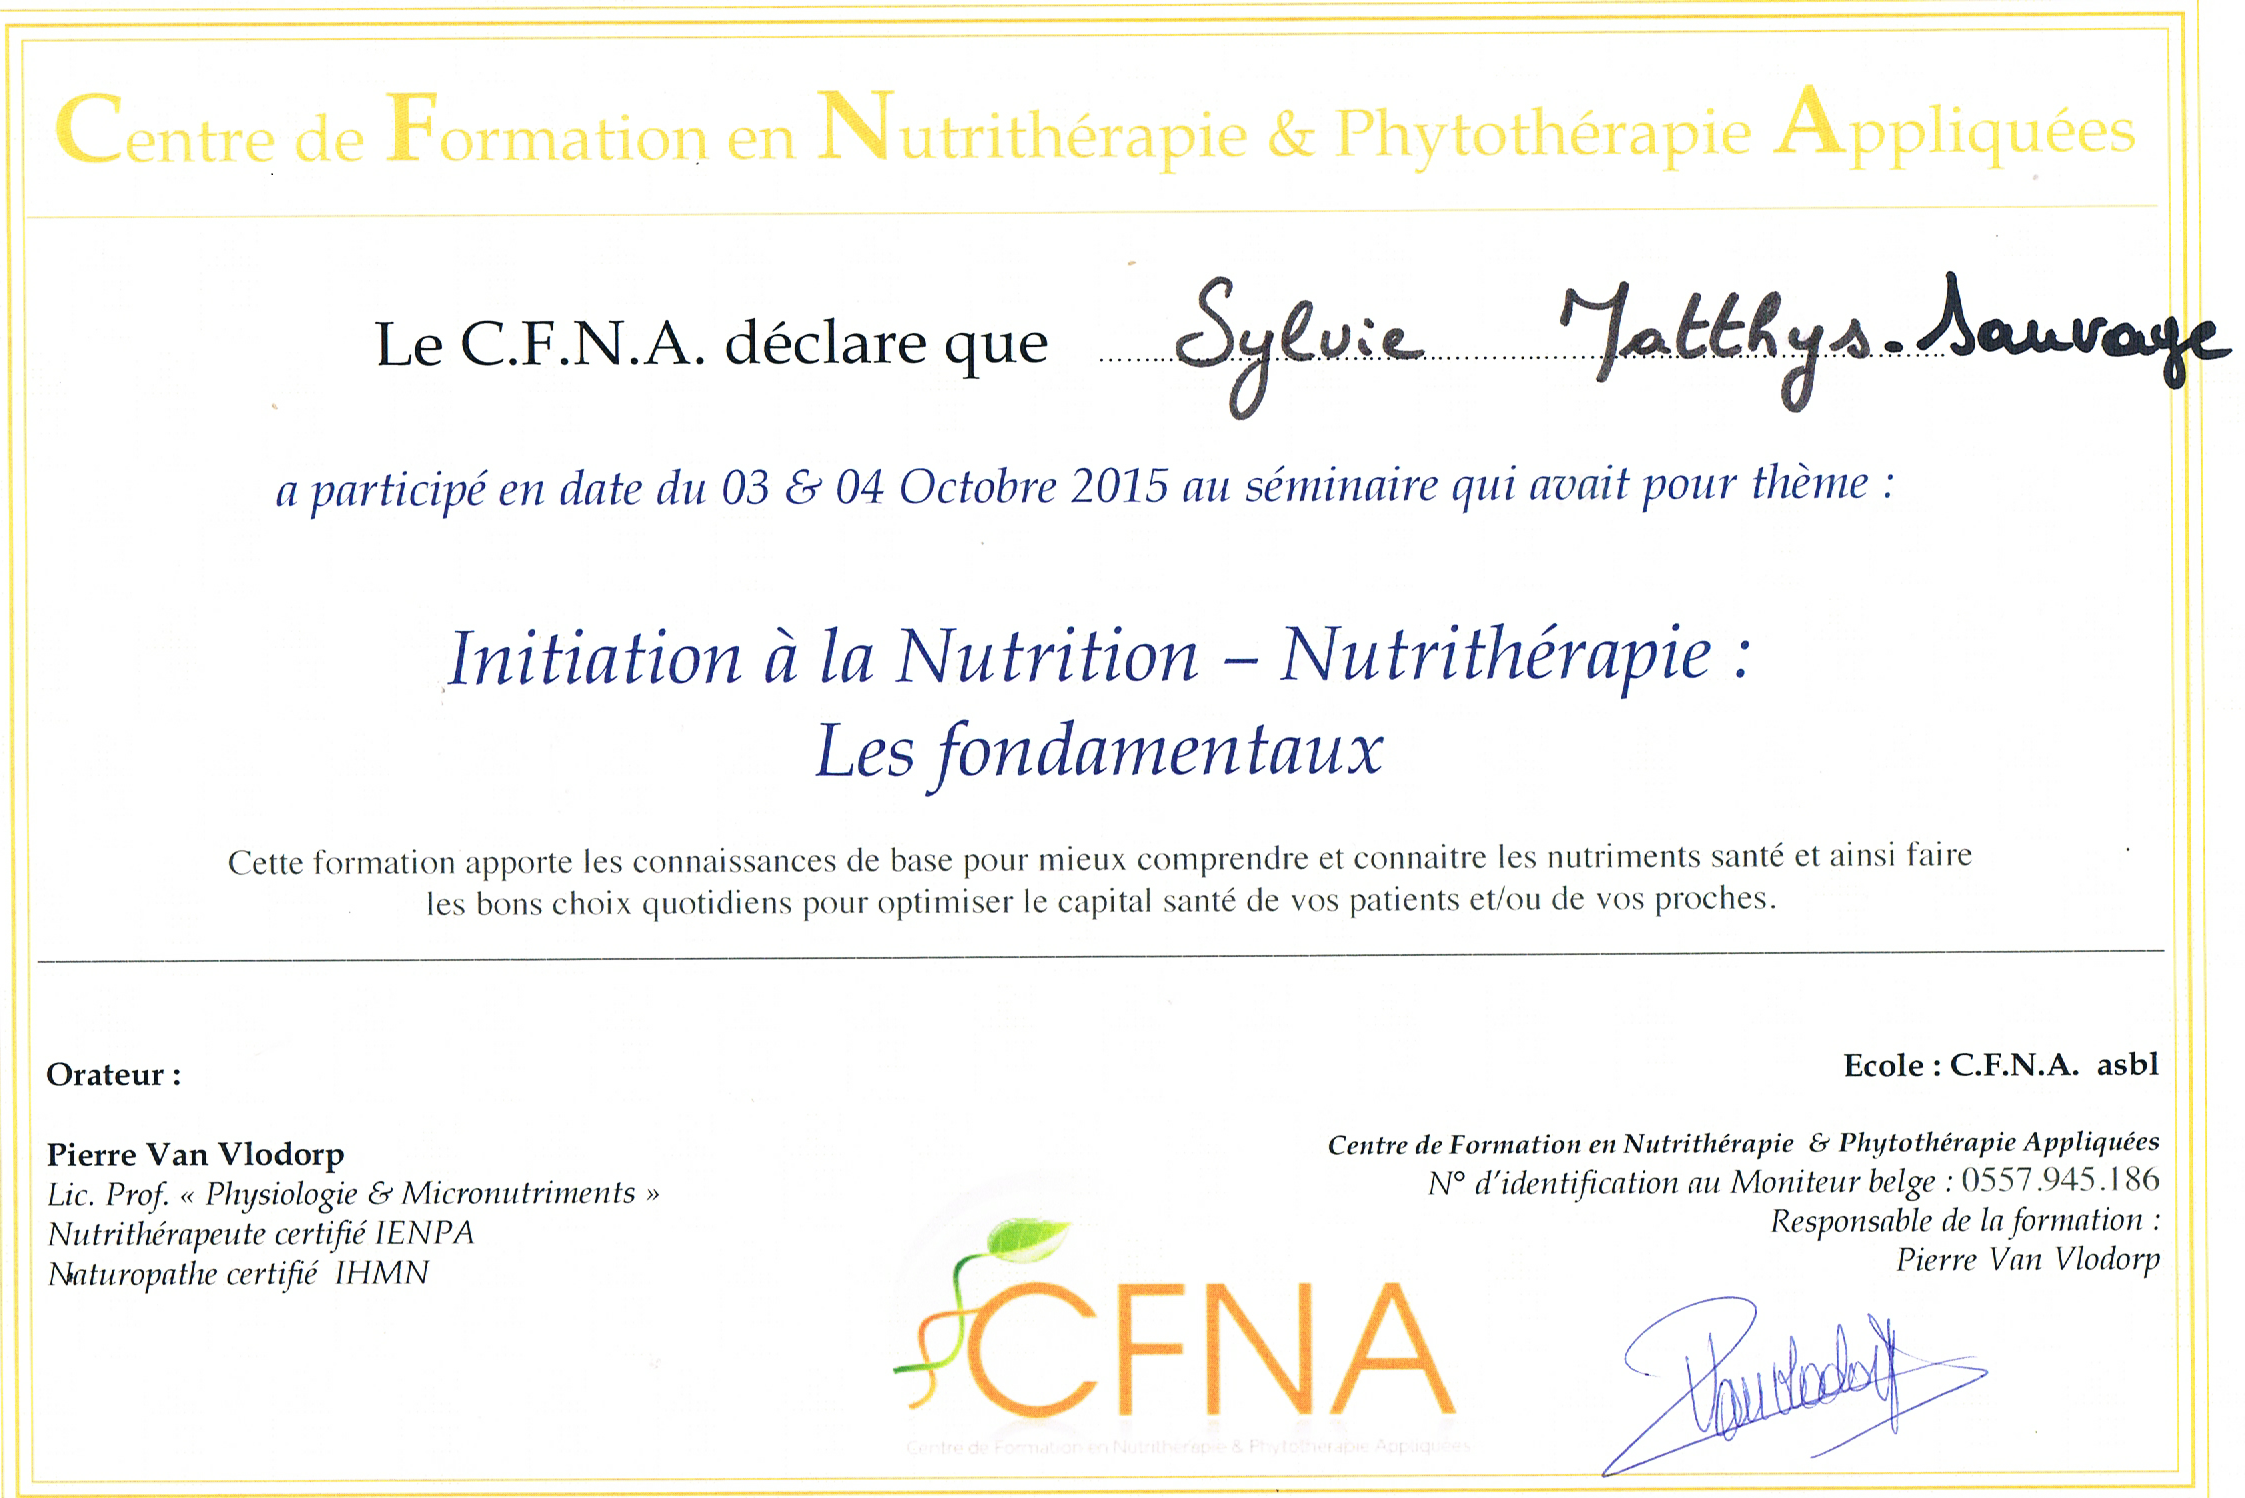 CFNA 1